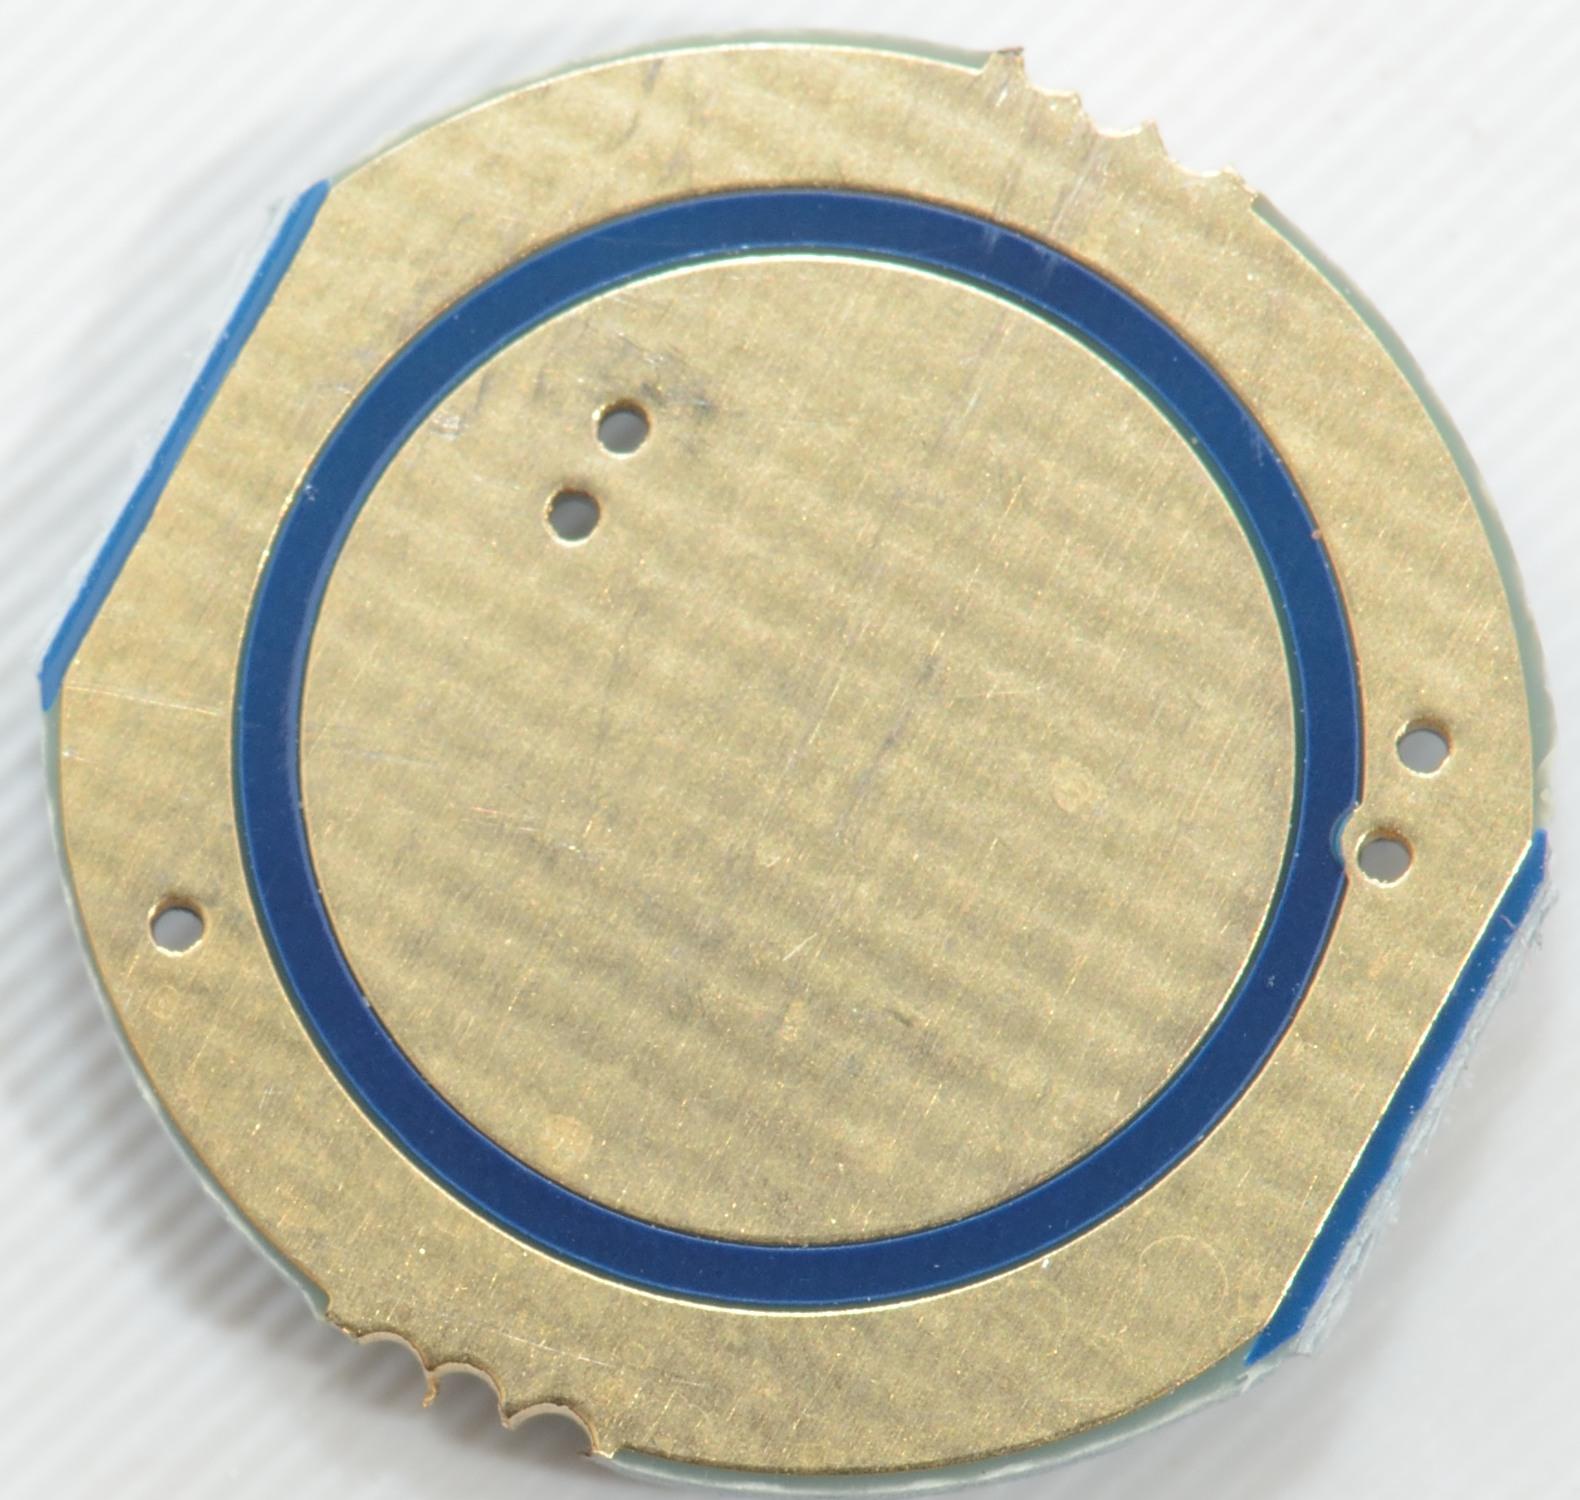 17mm 5mode Led Driver Circuit Board For Flashlight Diy Wiring 1050ma 5 Mode Rh Budgetlightforum Com